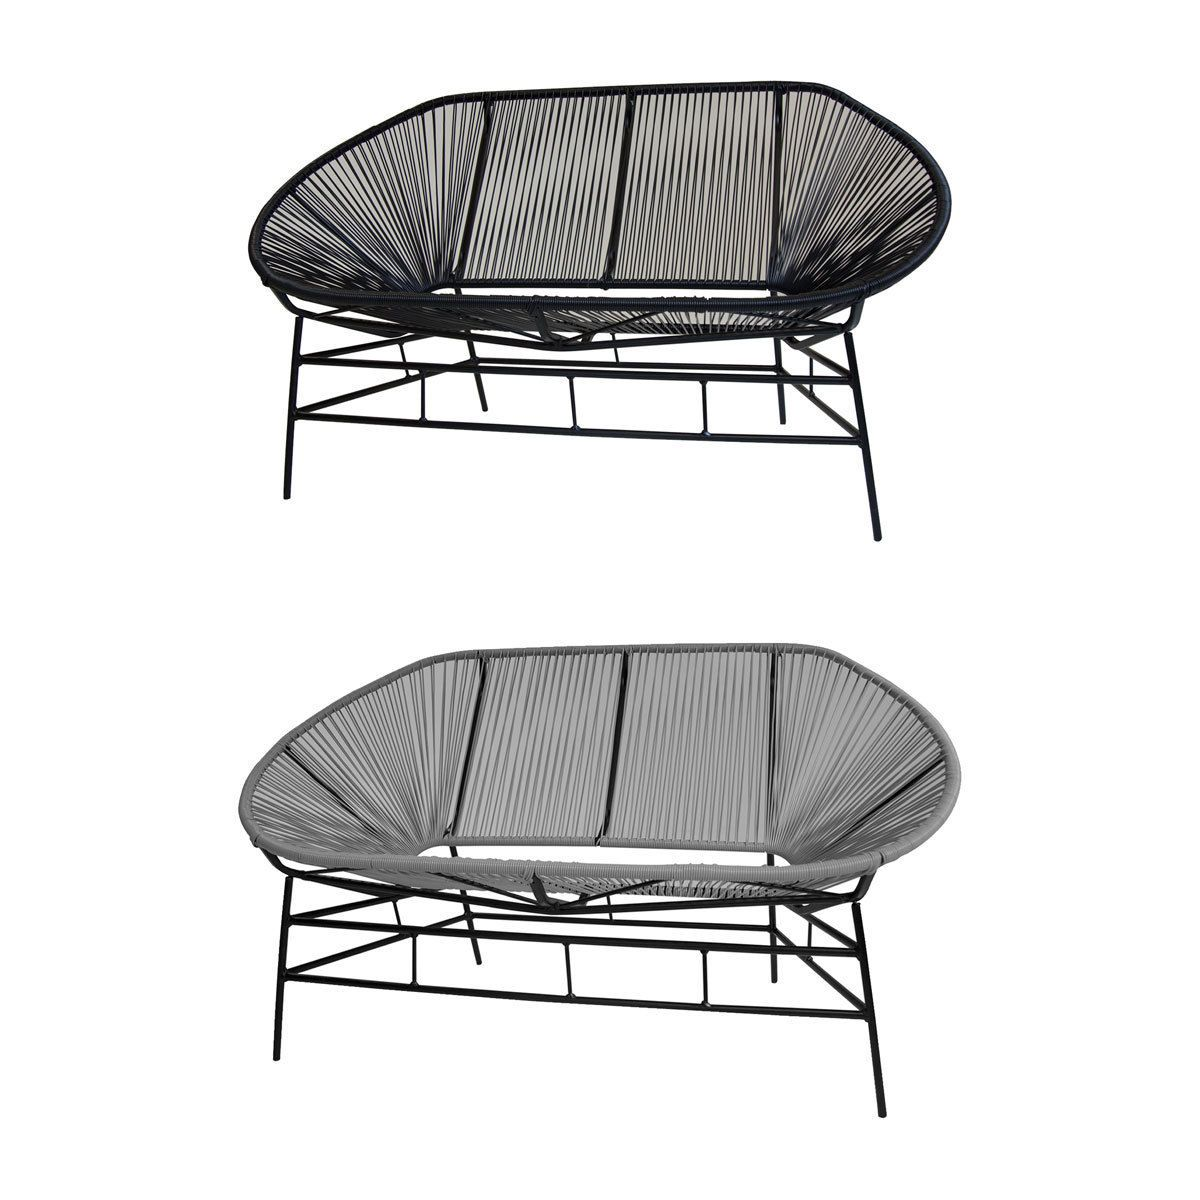 Details About Charles Bentley Garden Furniture Retro Rattan Lounge